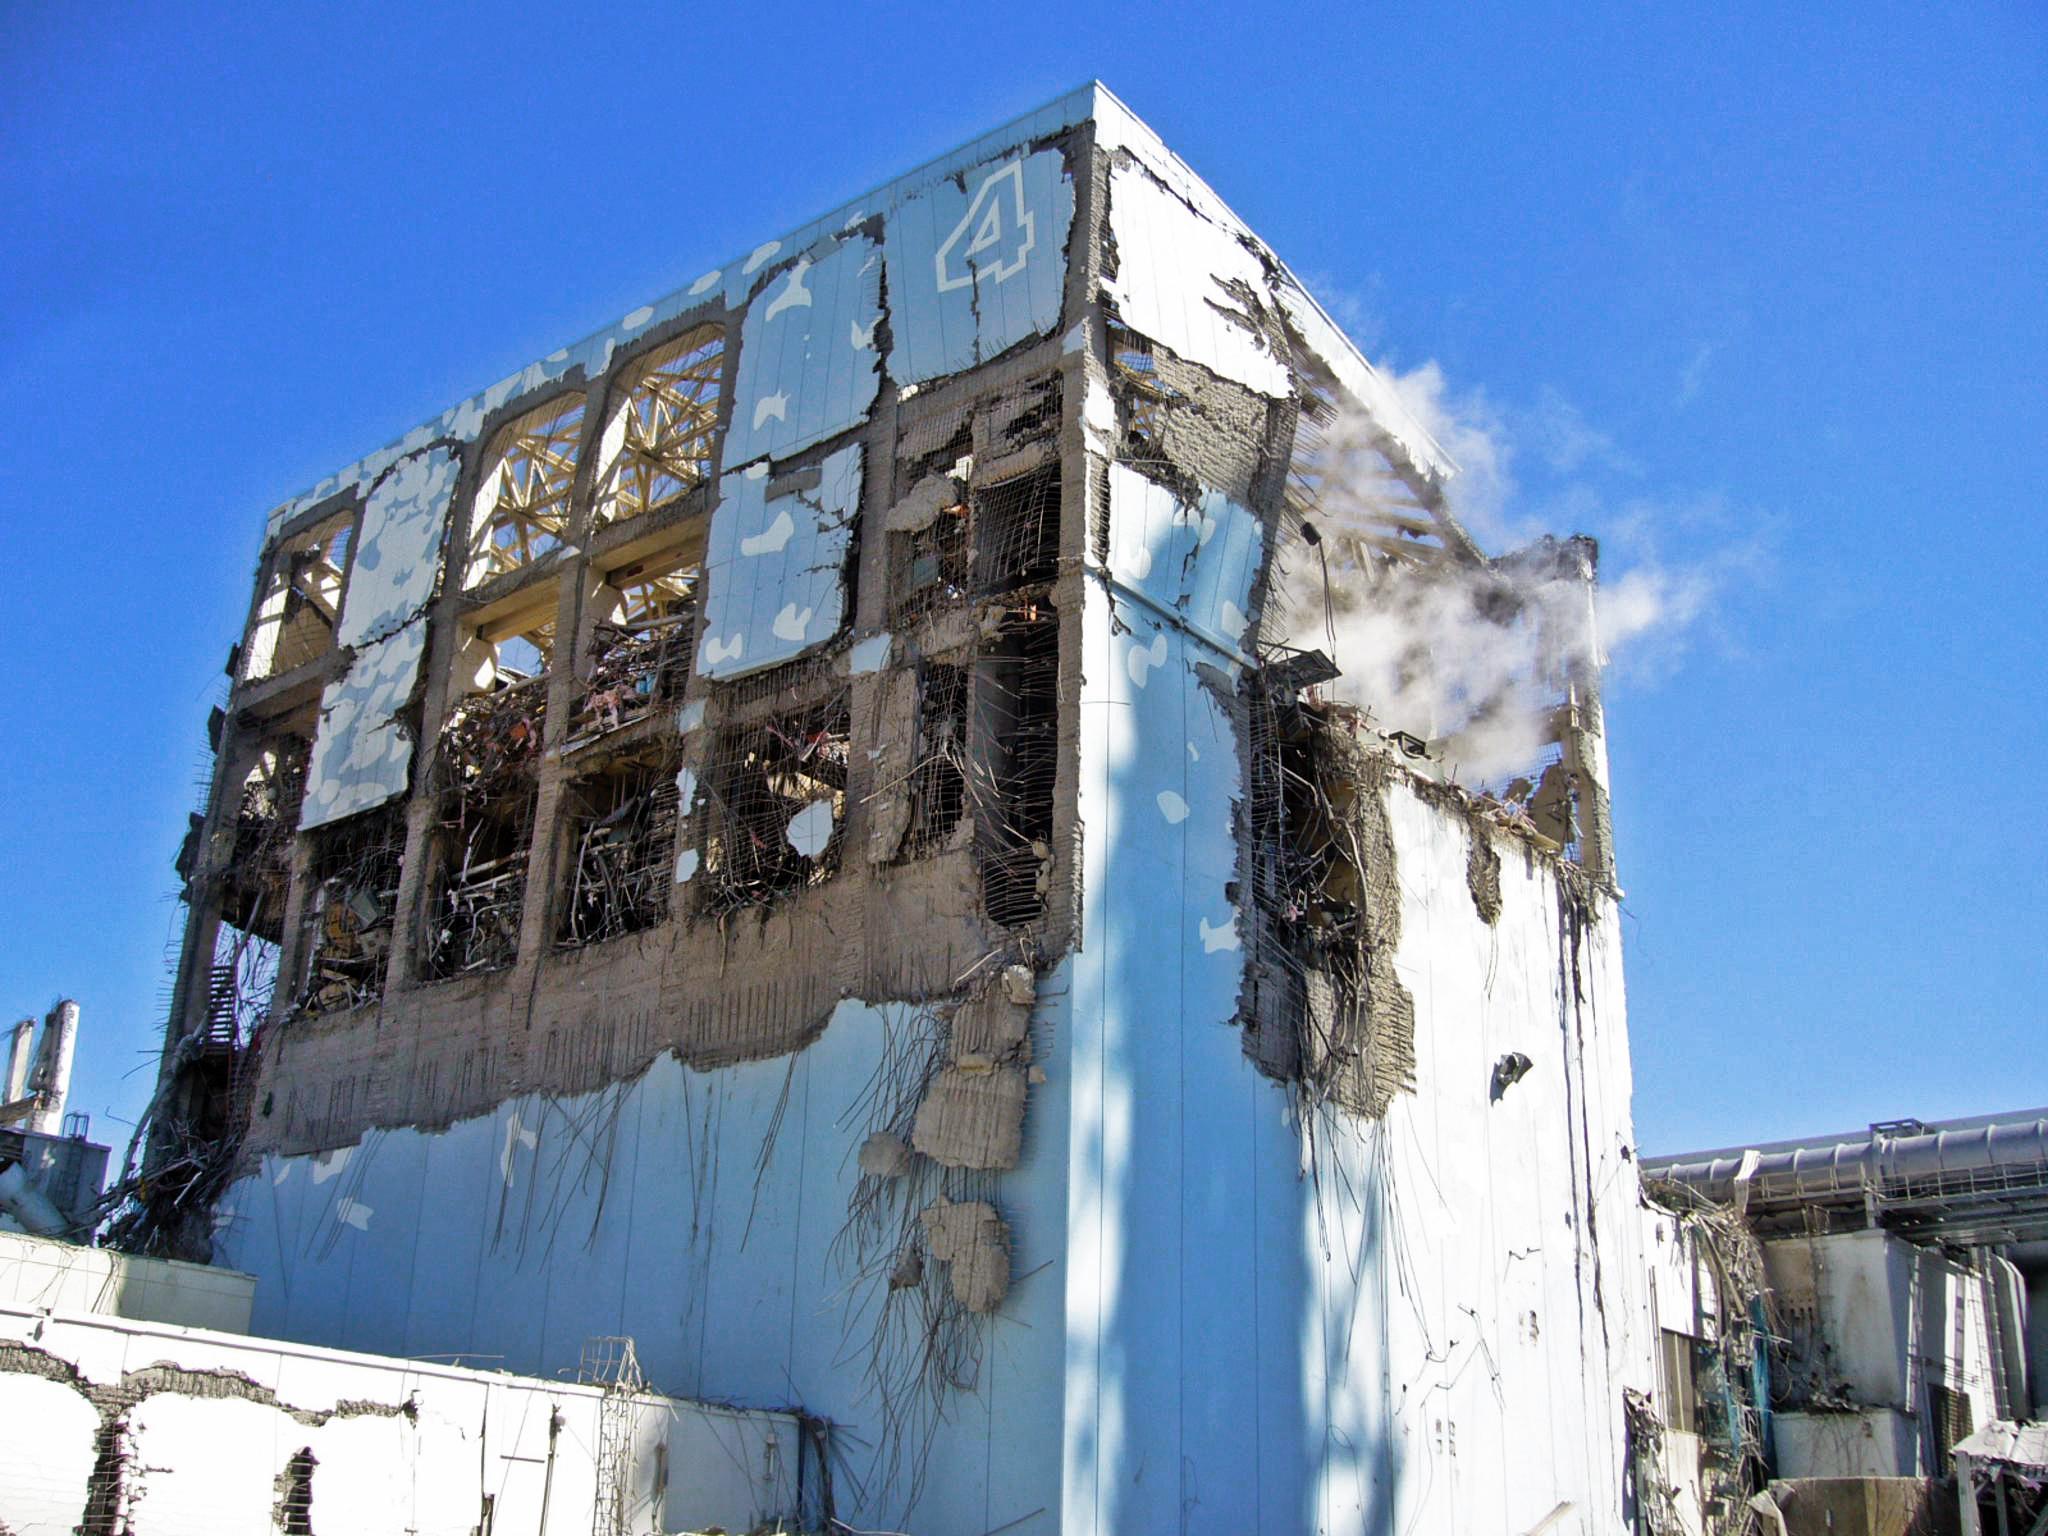 Fukushima-Daiichi-Unit-4-March-18th-2011-1014-1-Enformable.jpg